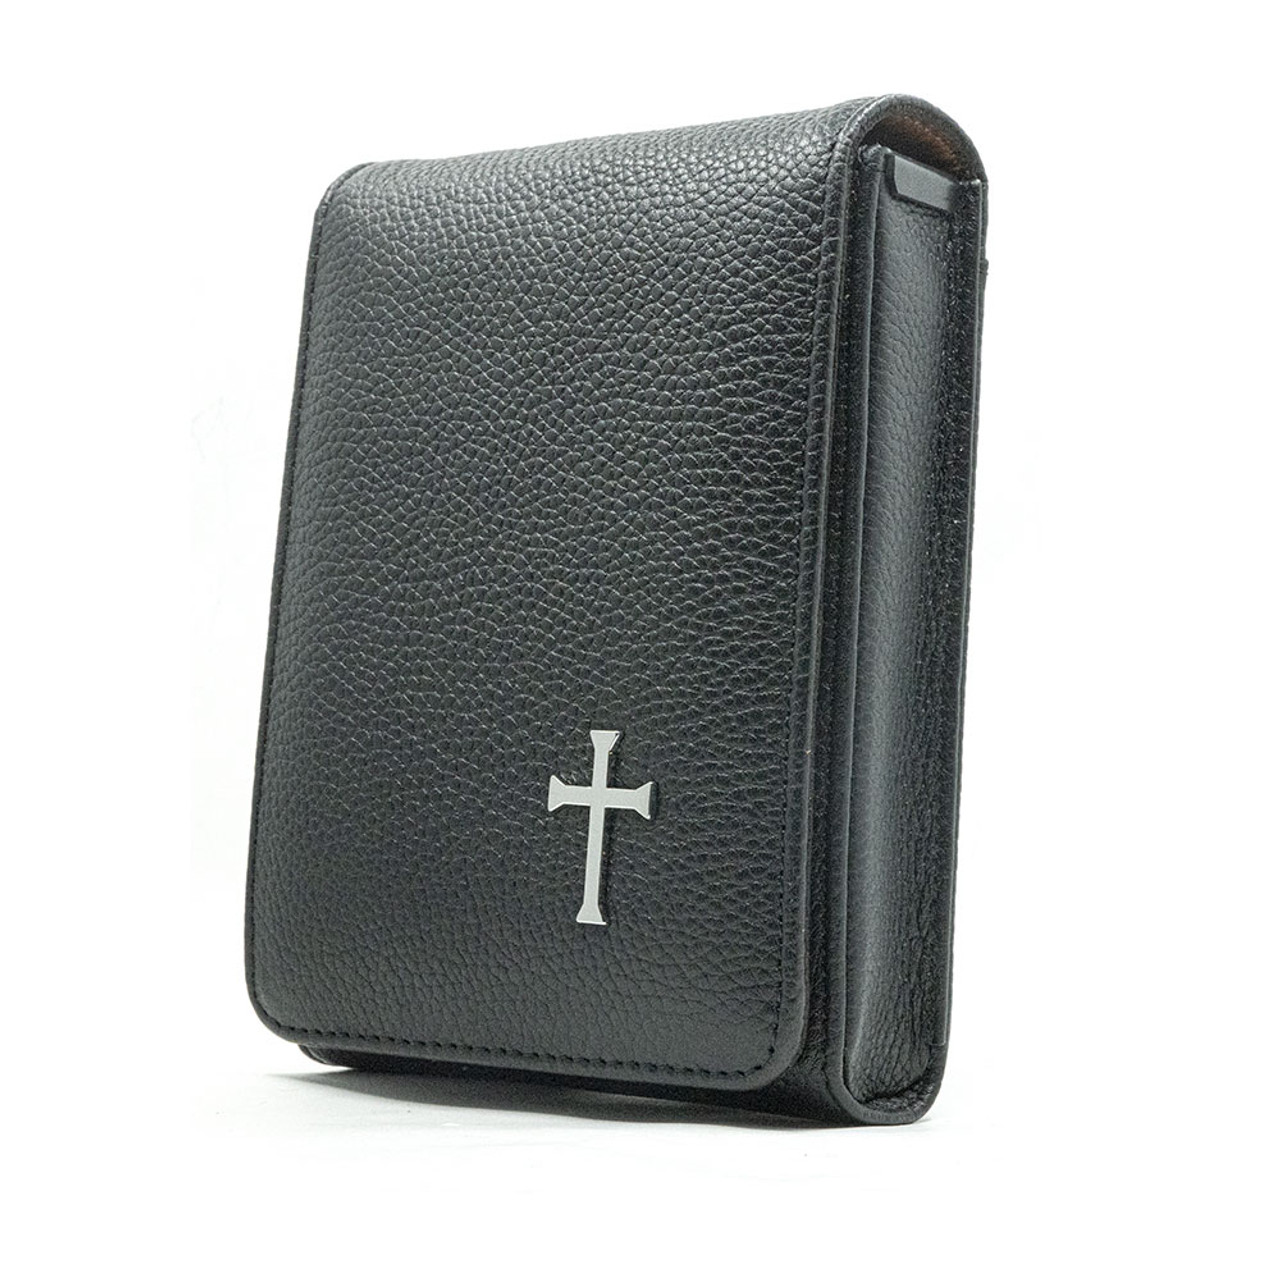 Taurus G2S Black Leather Cross Series Holster